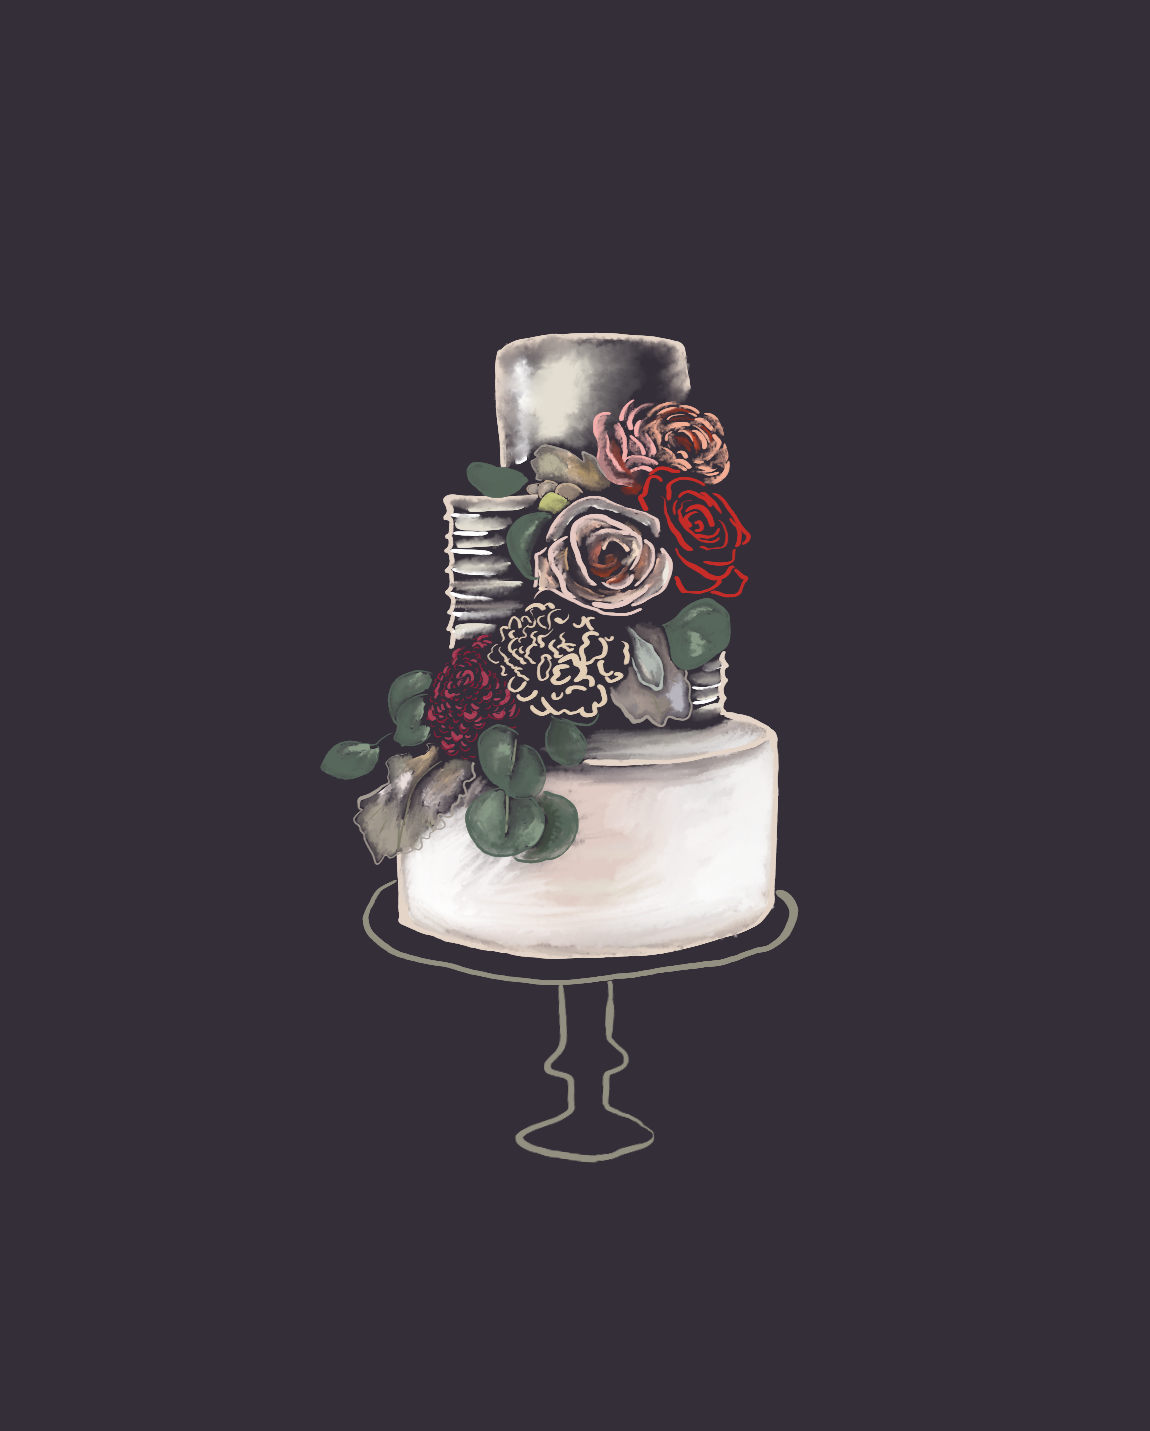 cake2_i.png